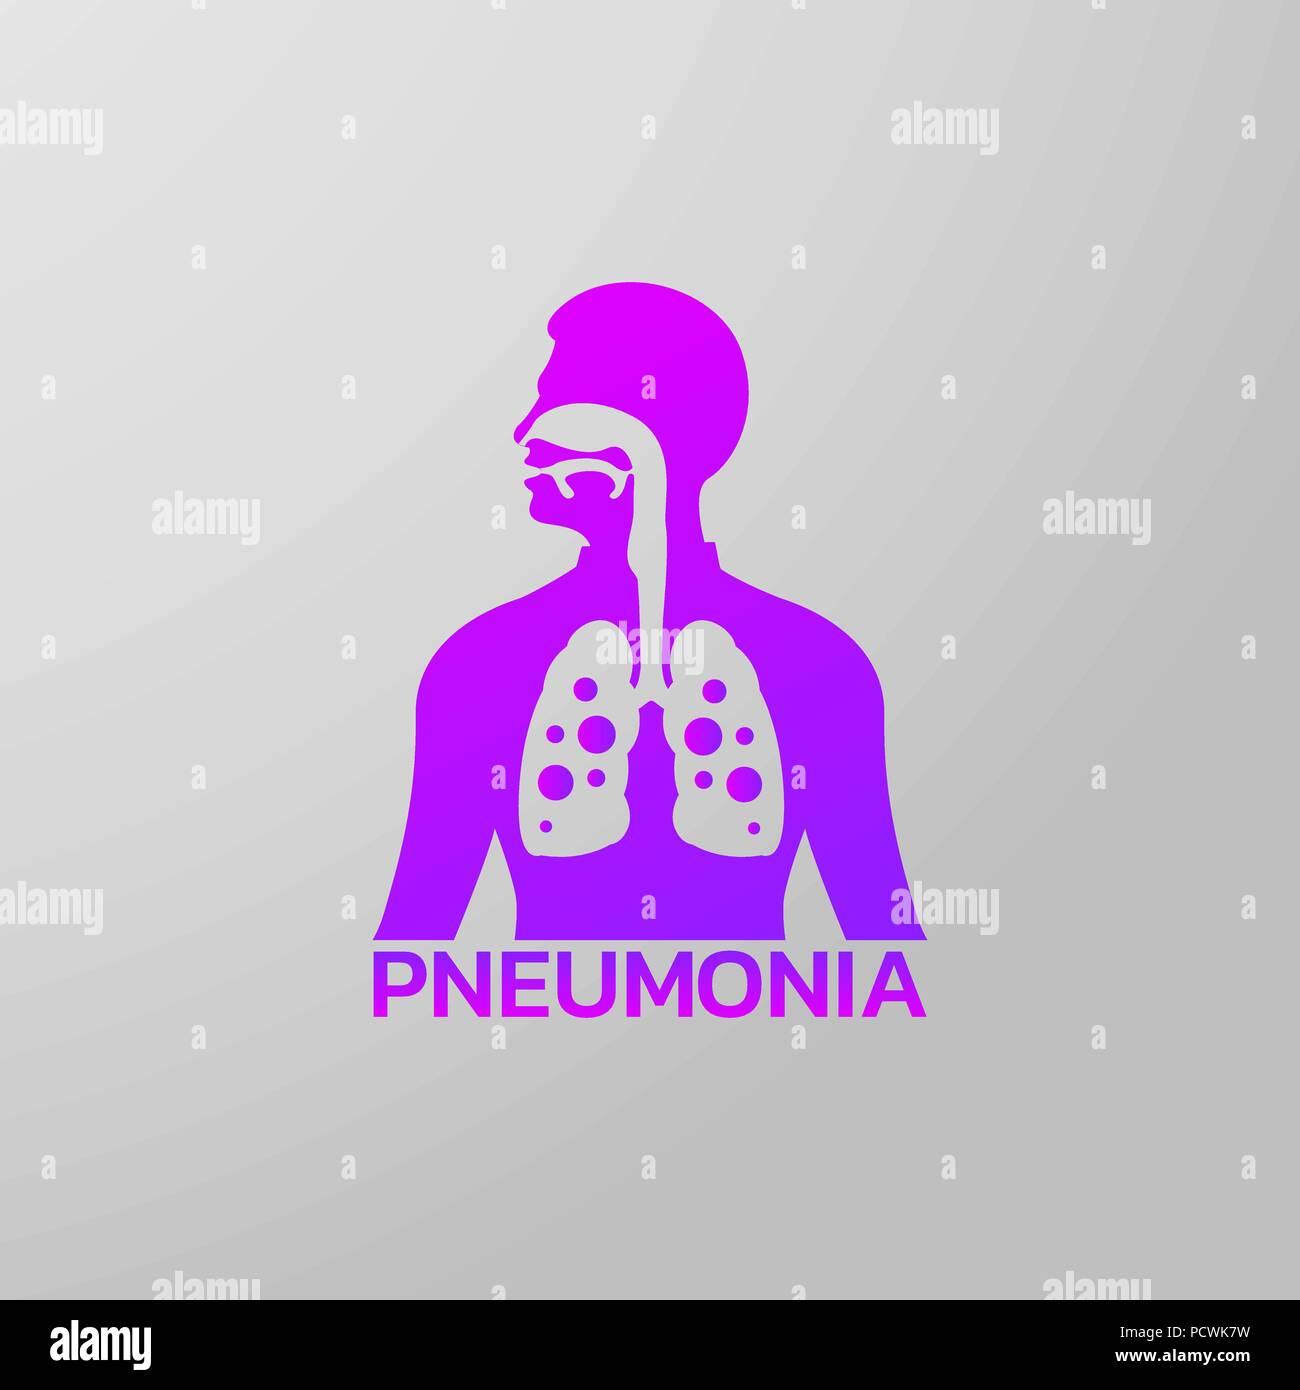 pneumonia icon design, infographic health, medical infographic. Vector illustration - Stock Vector